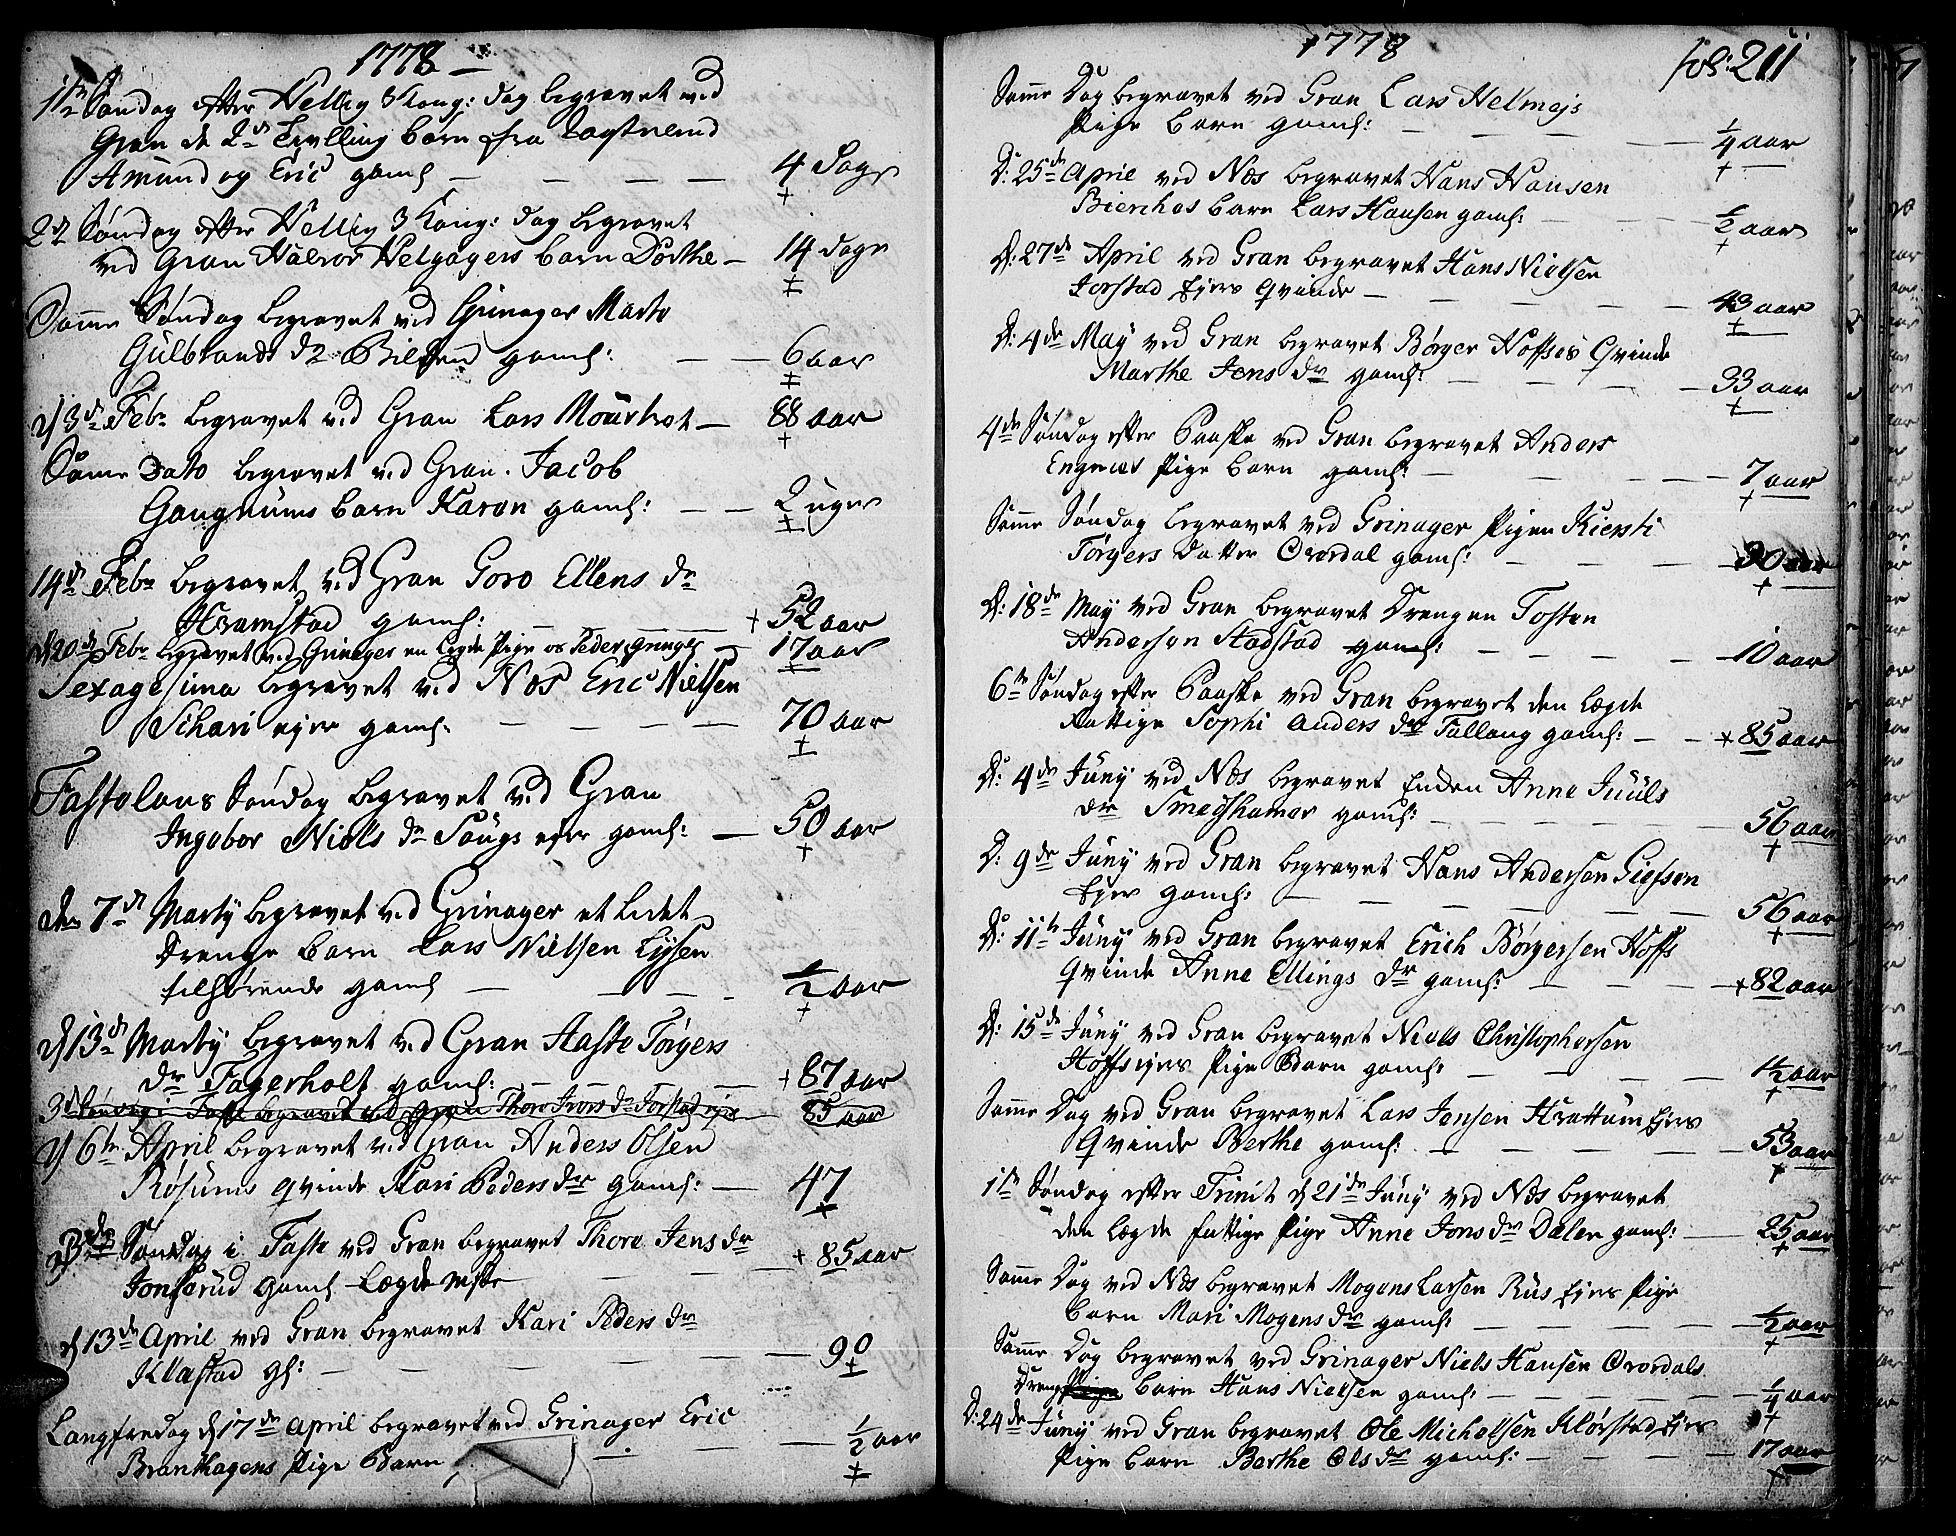 SAH, Gran prestekontor, Ministerialbok nr. 5, 1776-1788, s. 211